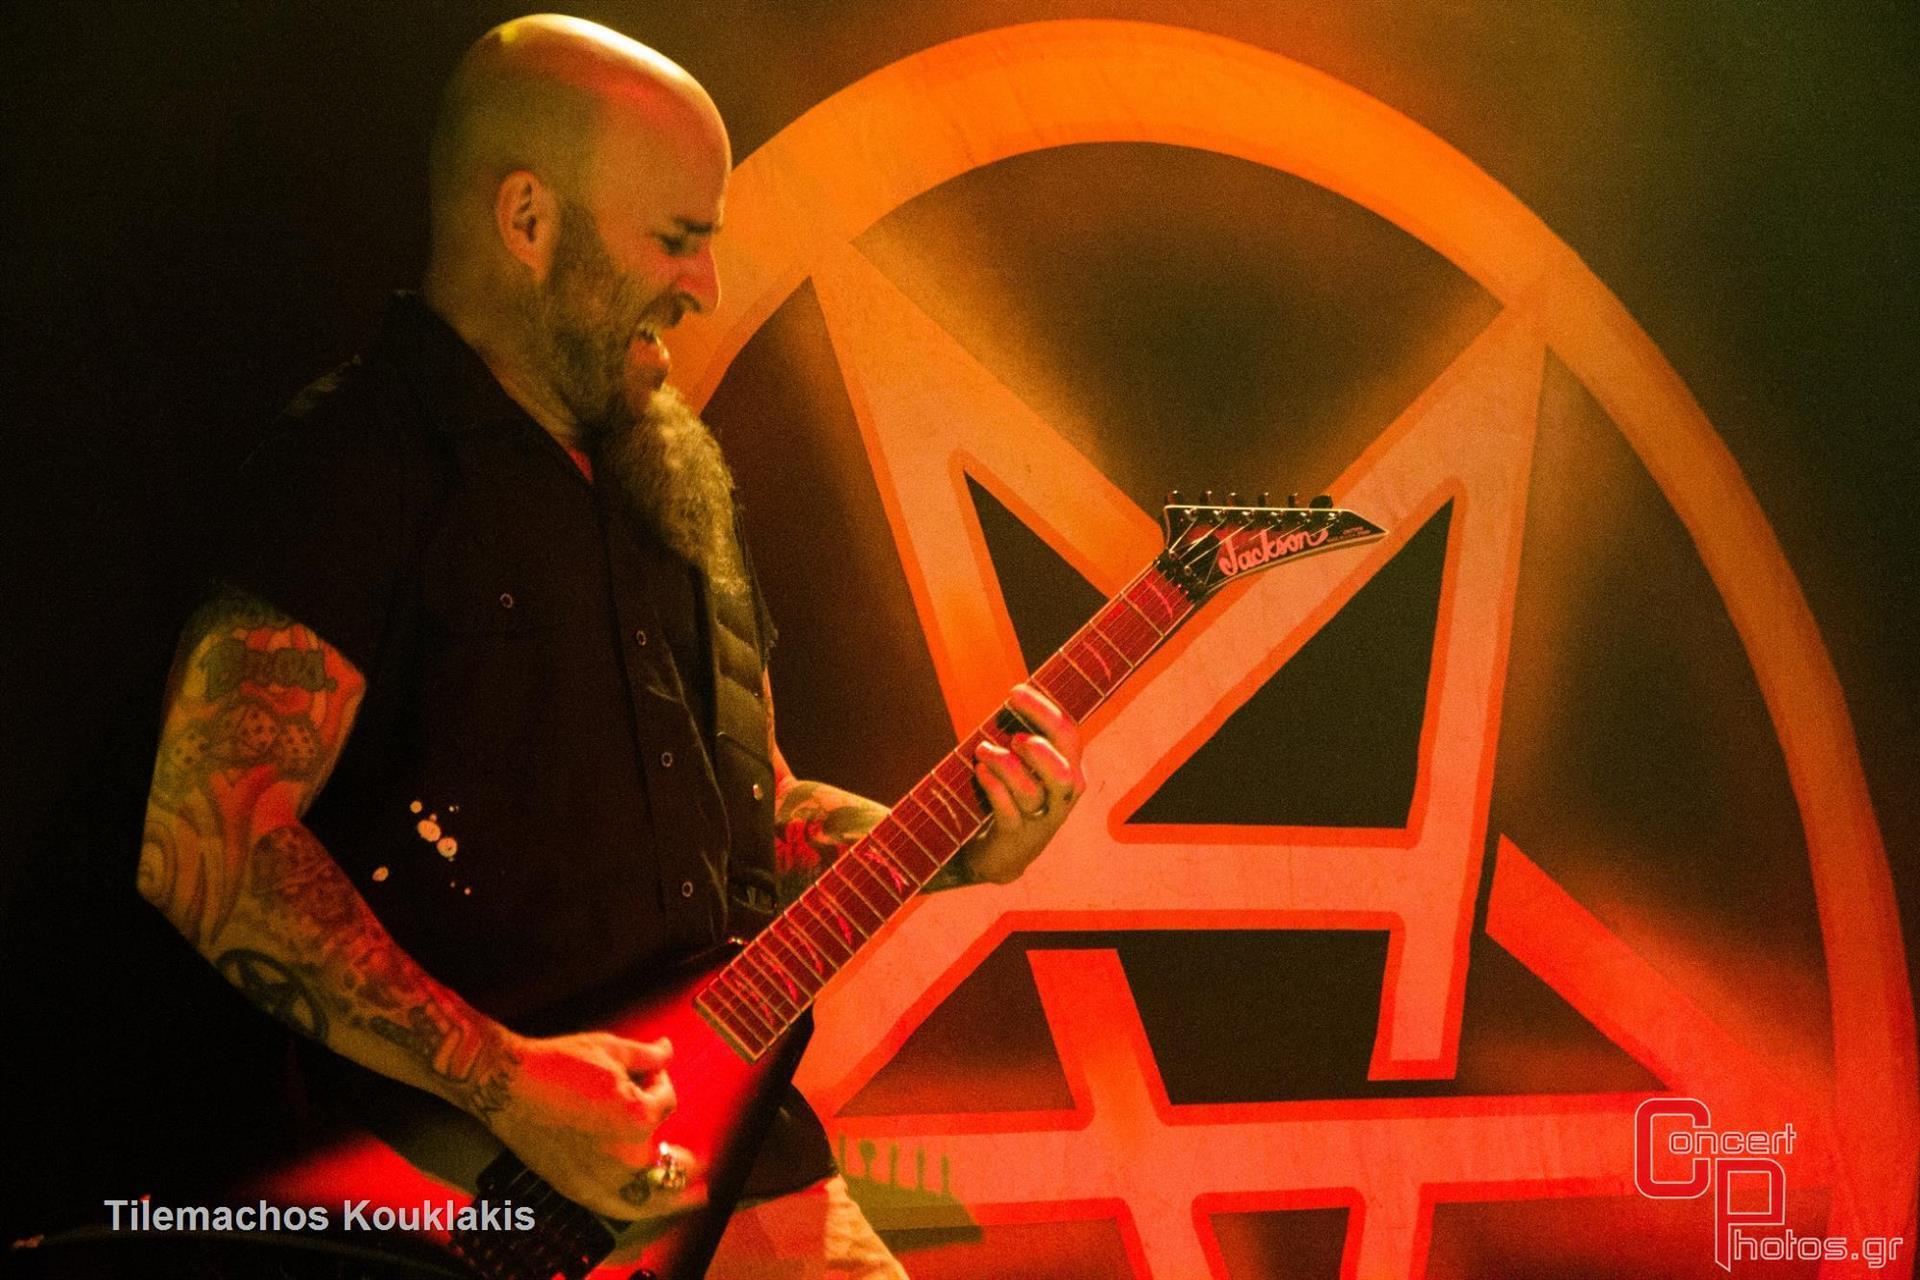 Anthrax-Anthrax photographer: Tilemachos Kouklakis - IMG_1512